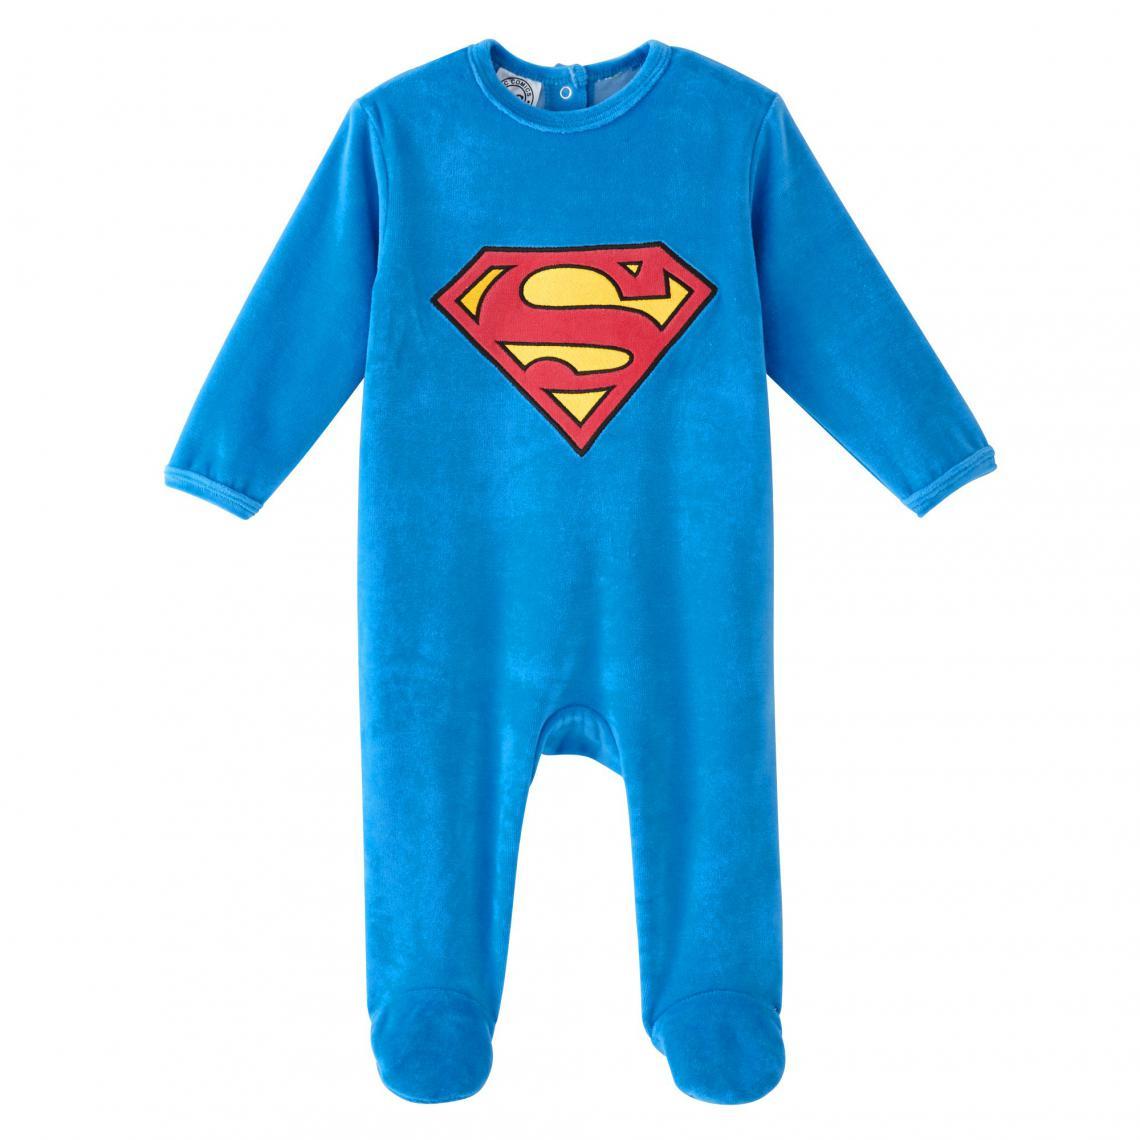 Dors bien velours b�b� gar�on Superman - Bleu - 3Suisses